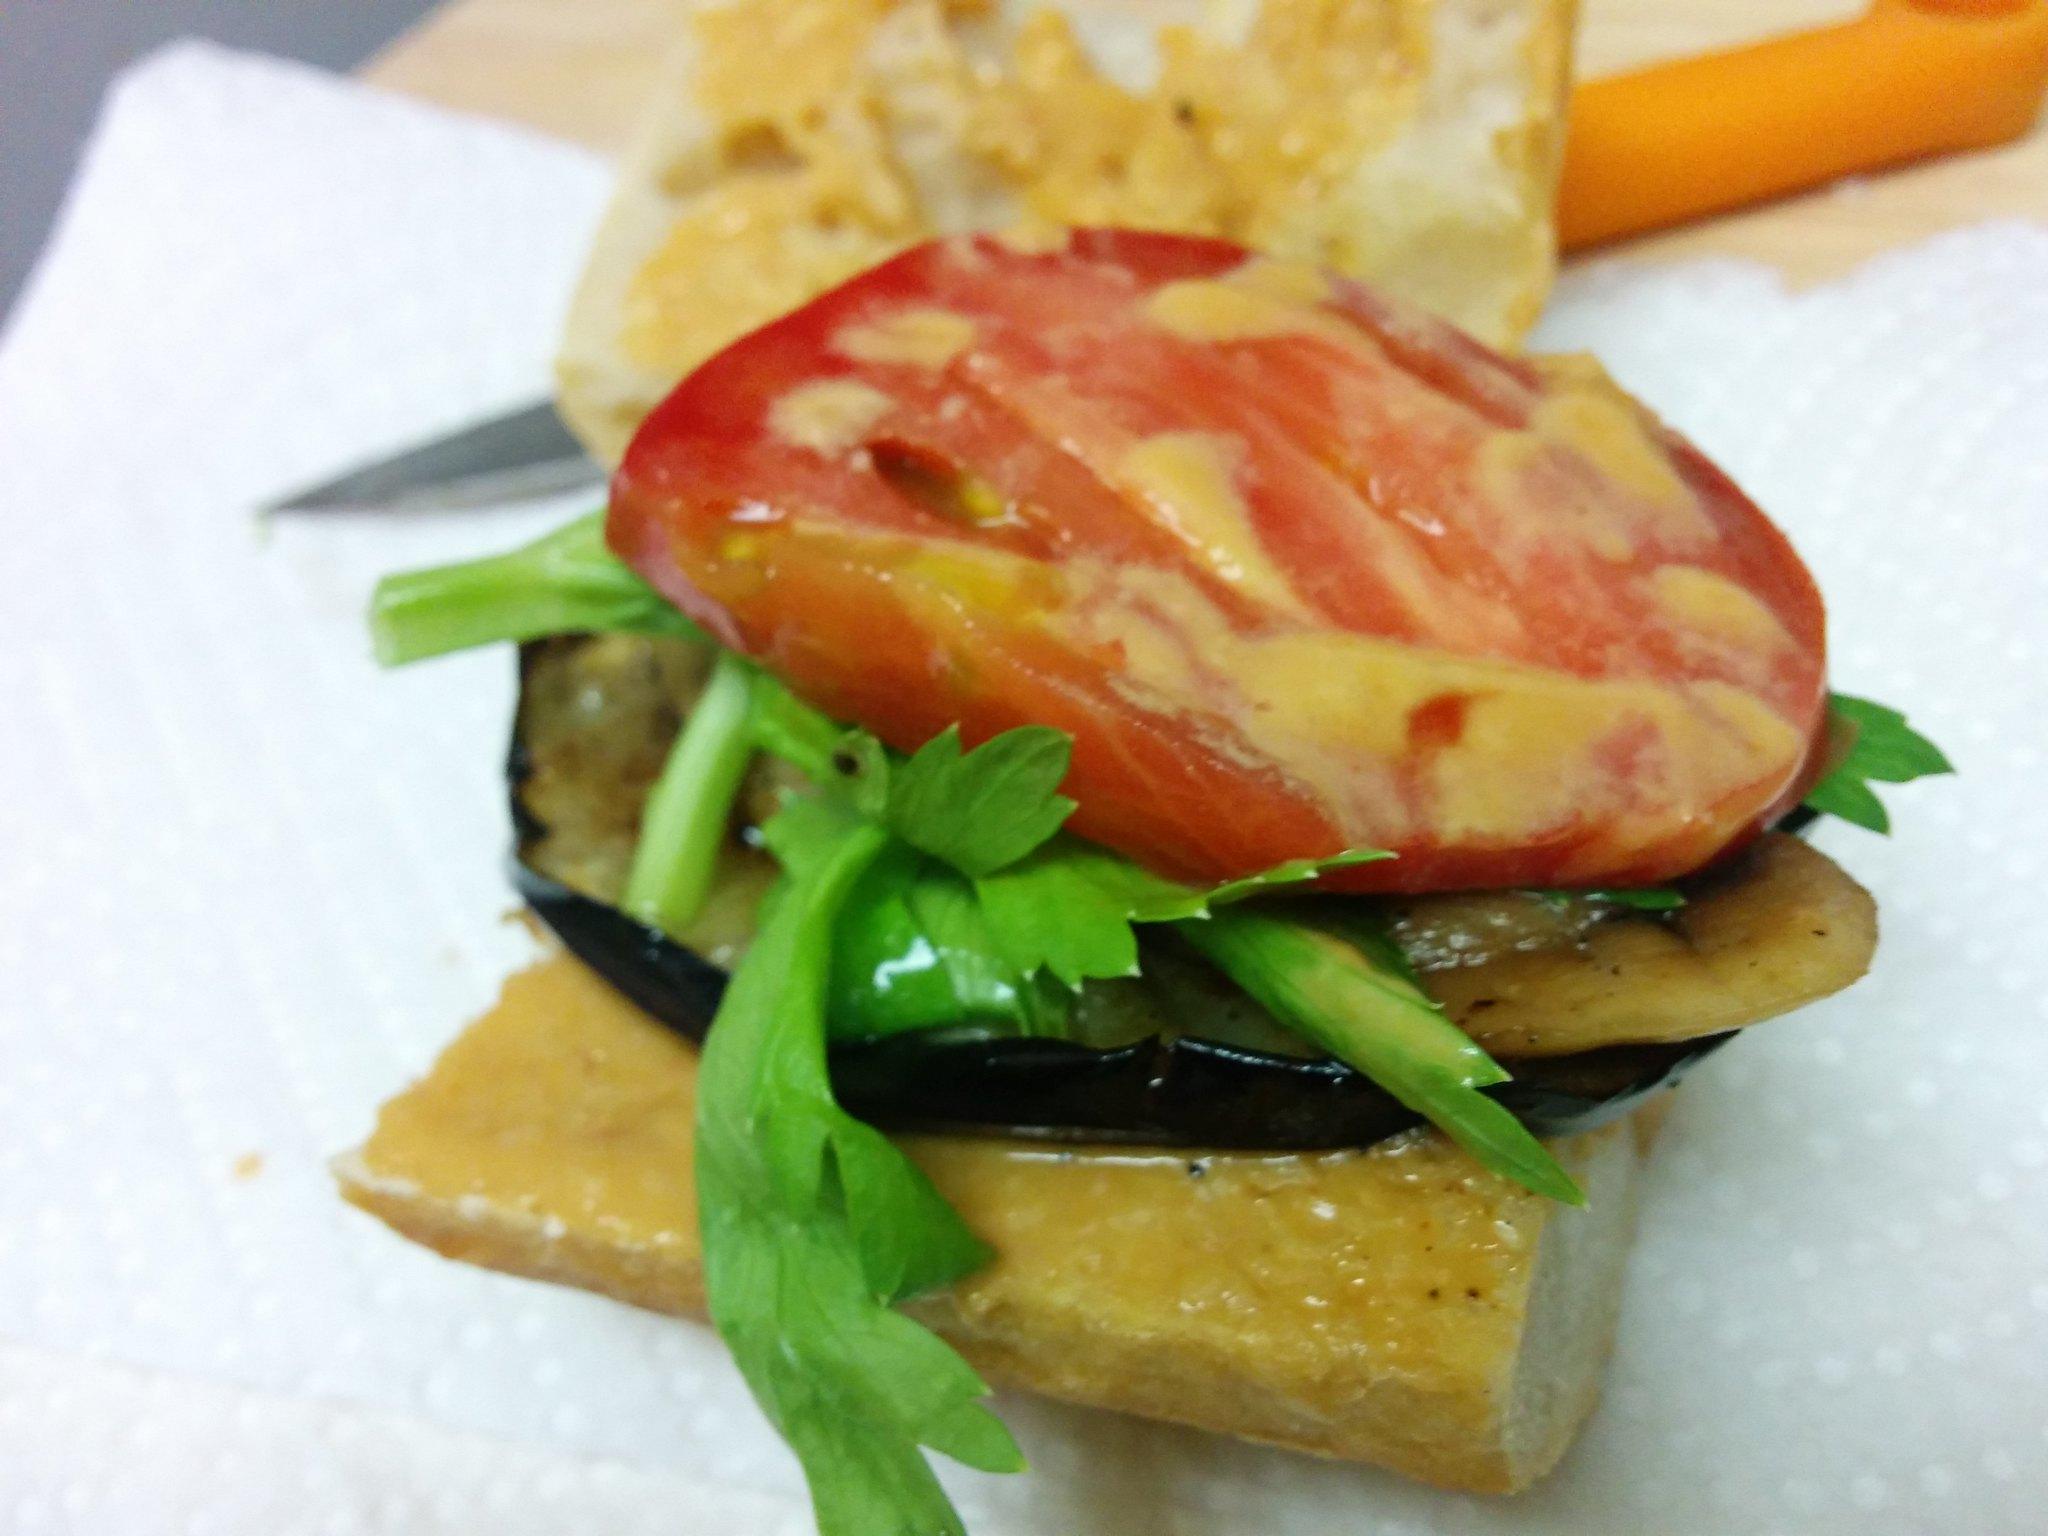 Eggplant and Tomatoes Vegan Sandwich